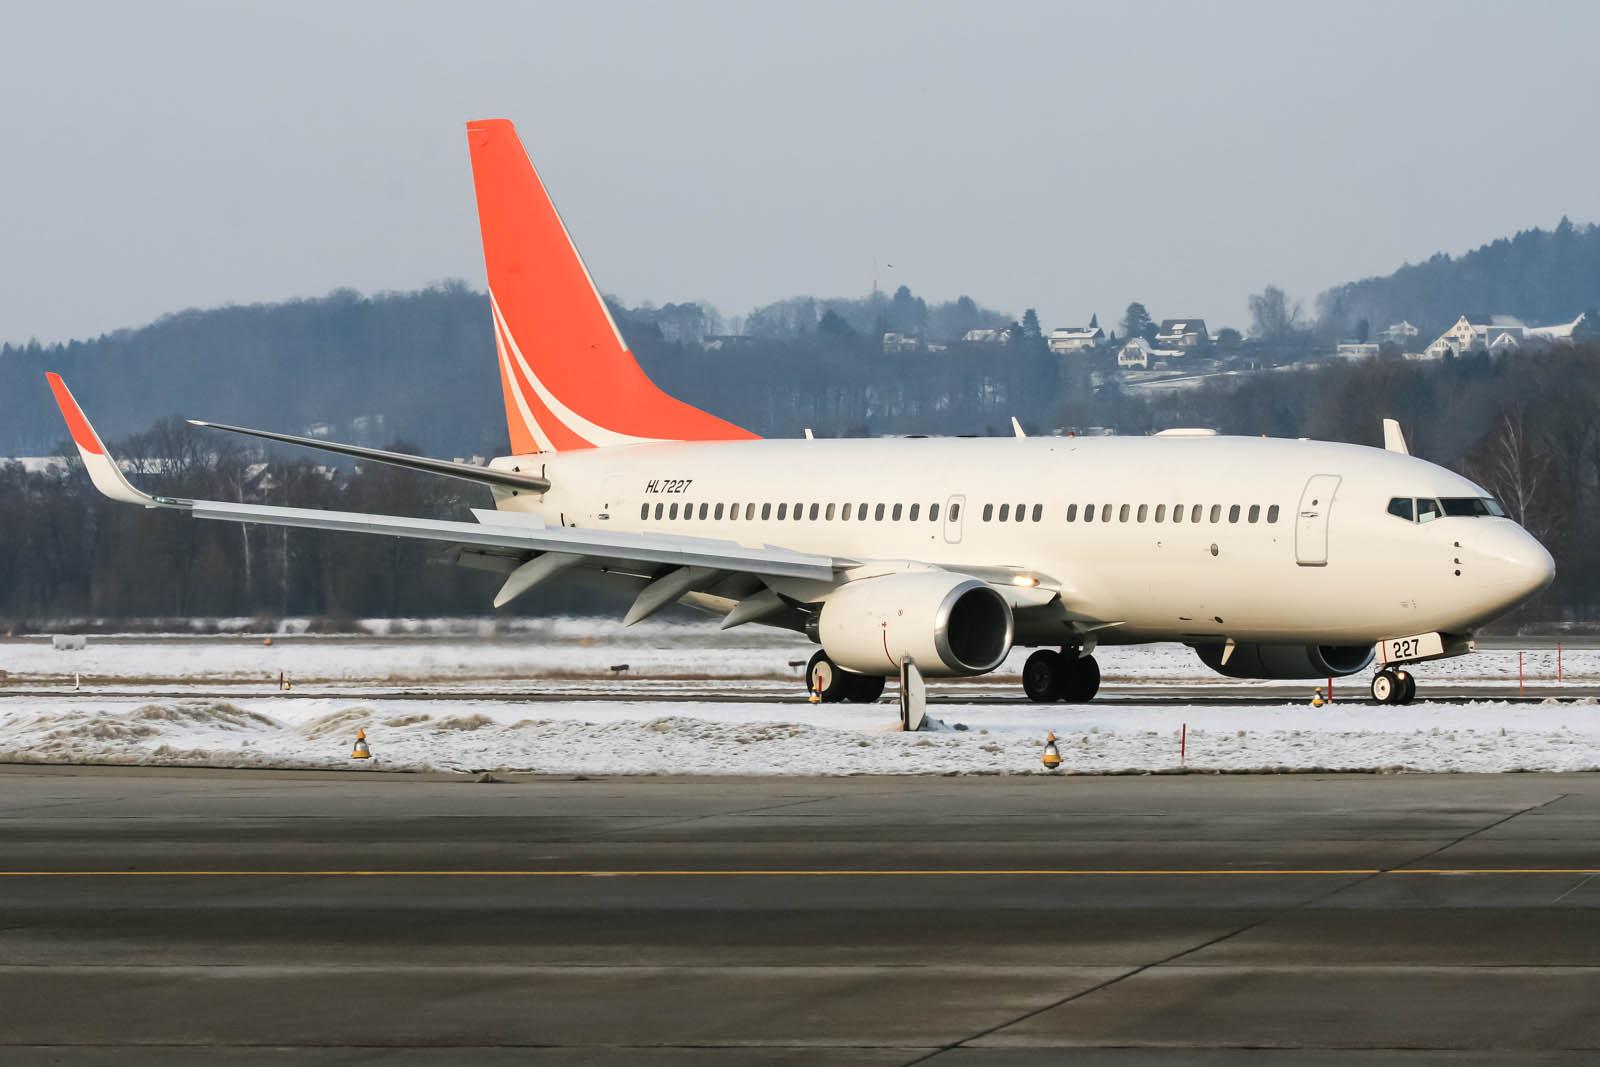 HL7227 Hanwha Chemical Corp Boeing 737-7HF(BBJ)